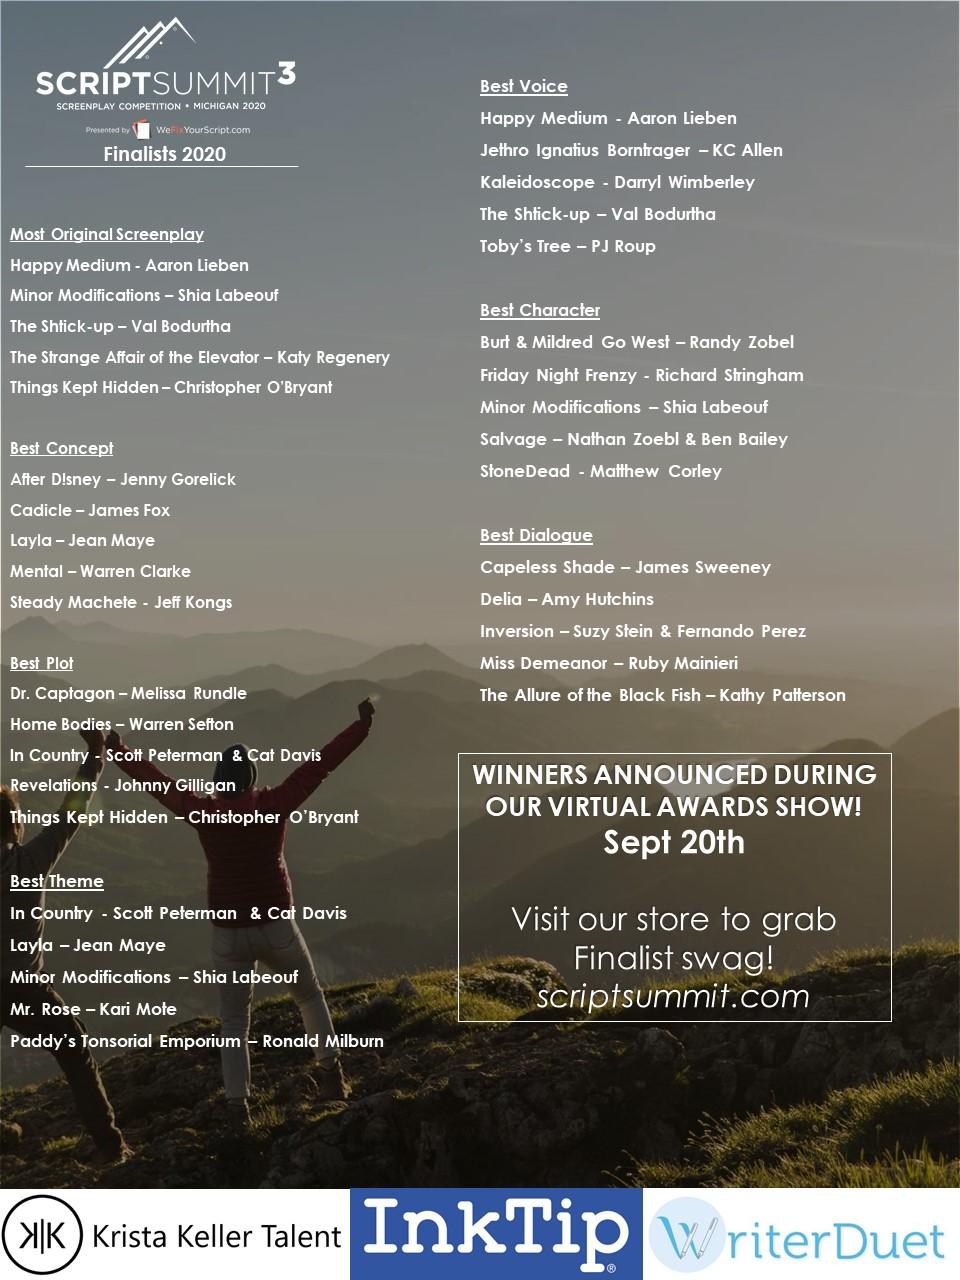 Finalists 2020